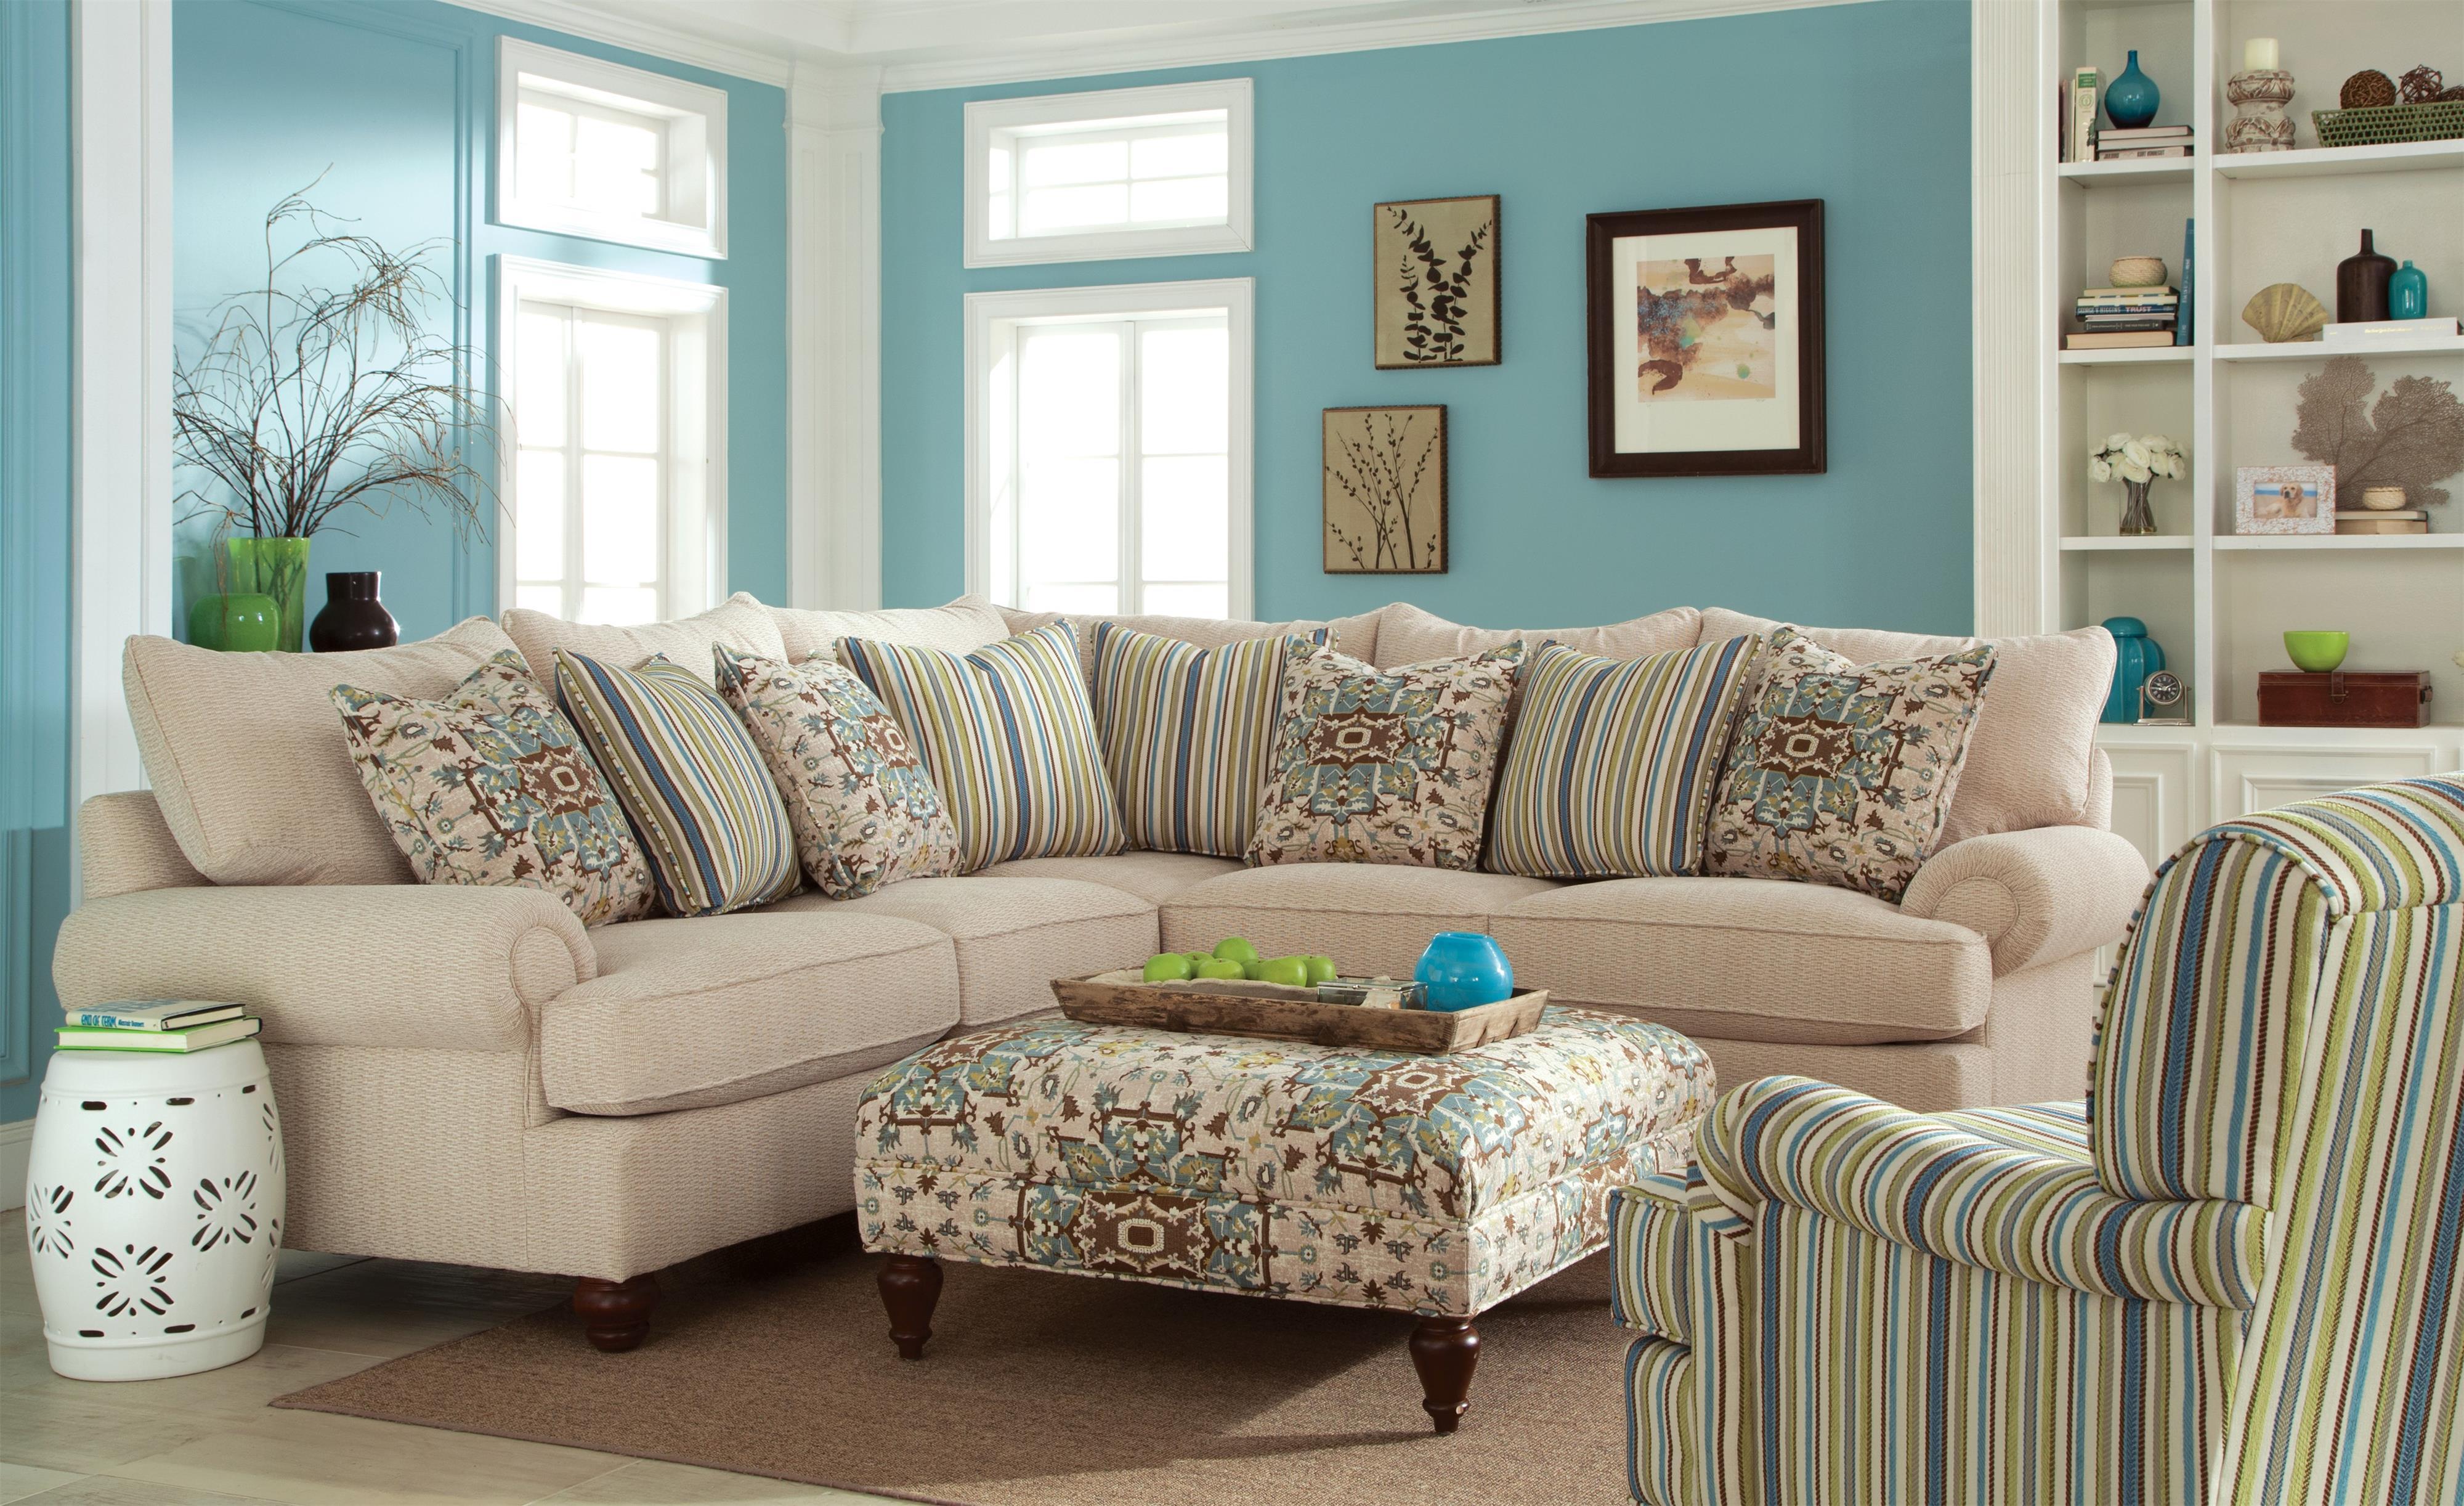 Craftmaster 7970 Traditional Sofa With Exposed Wood Feet   Turk Furniture    Sofas Joliet, Bolingbrook, La Salle, Kankakee, Naperville, Aurora,  Plainfield, ...